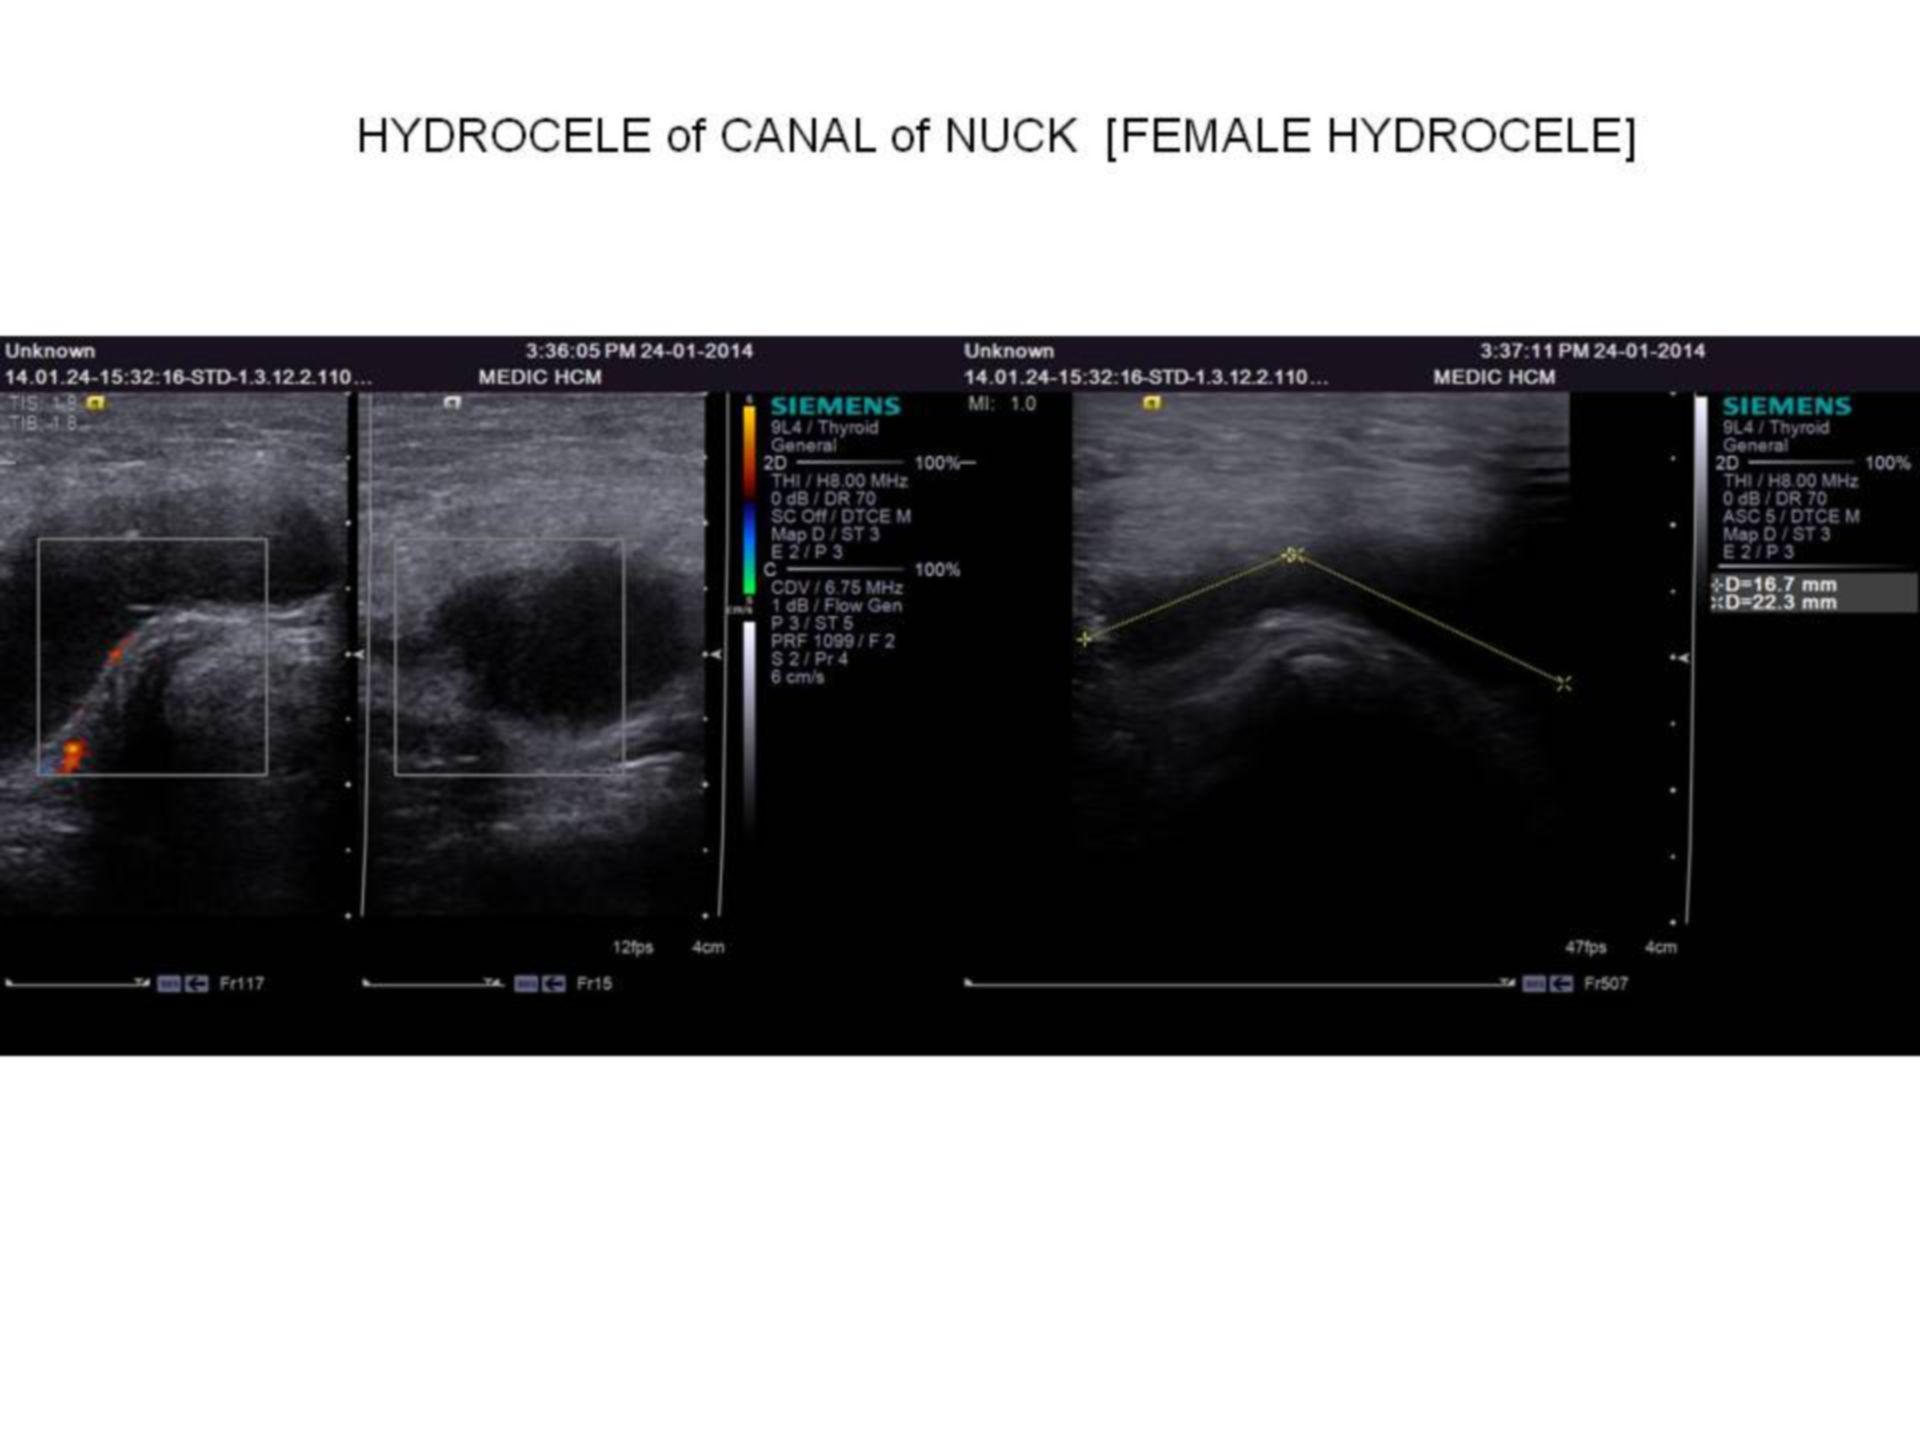 Hydrozele - Sonographie